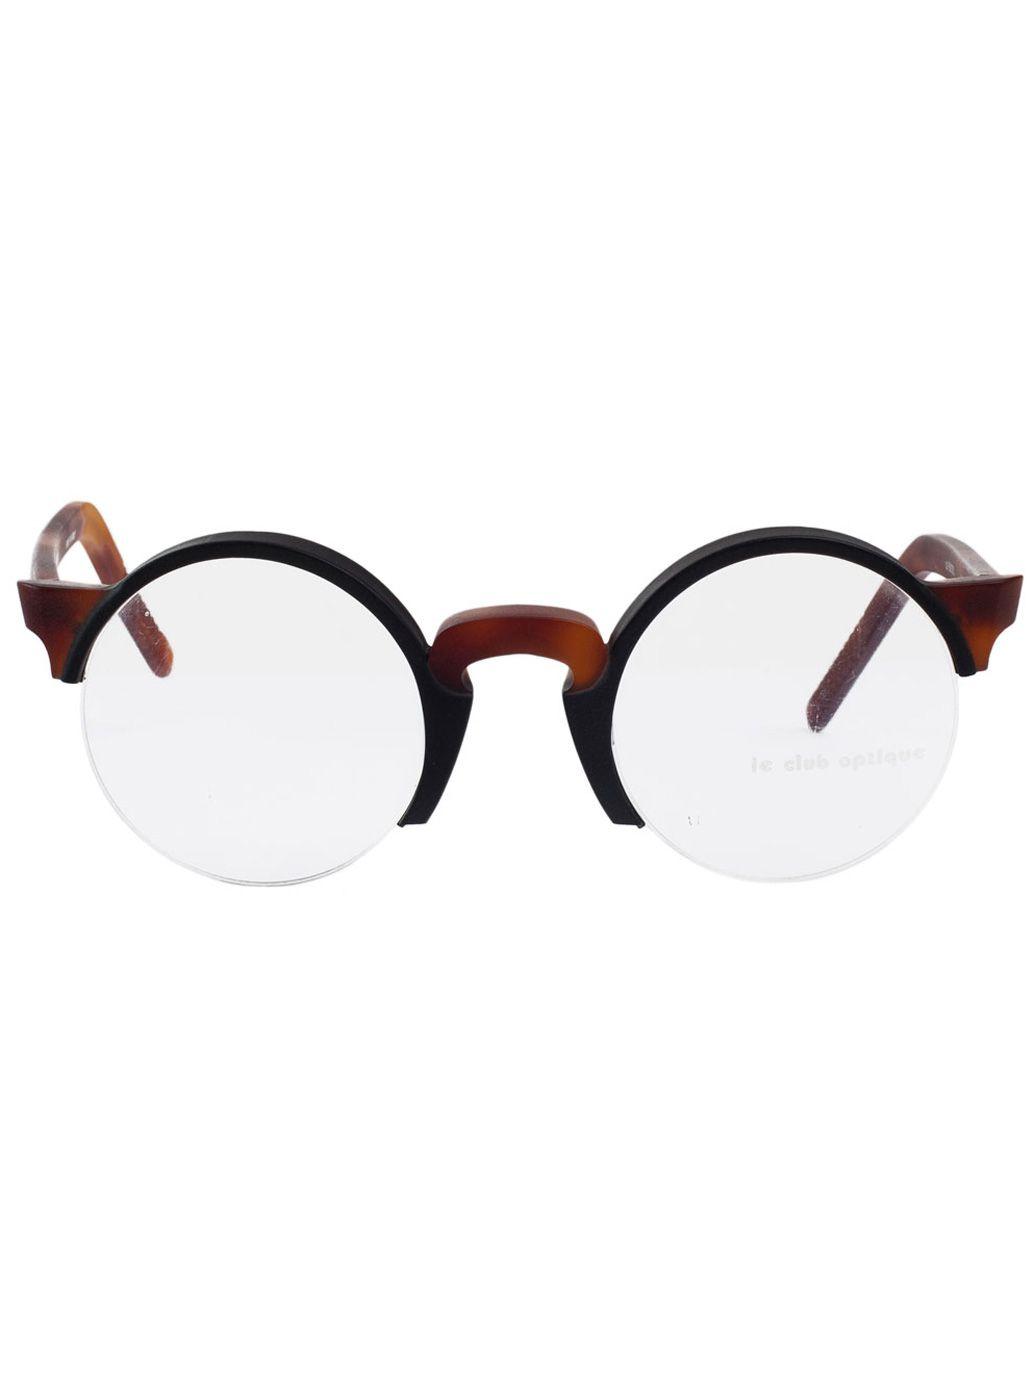 Vintage Le Club Optique Round Black/Tortoise Shell Eyeglasses ...